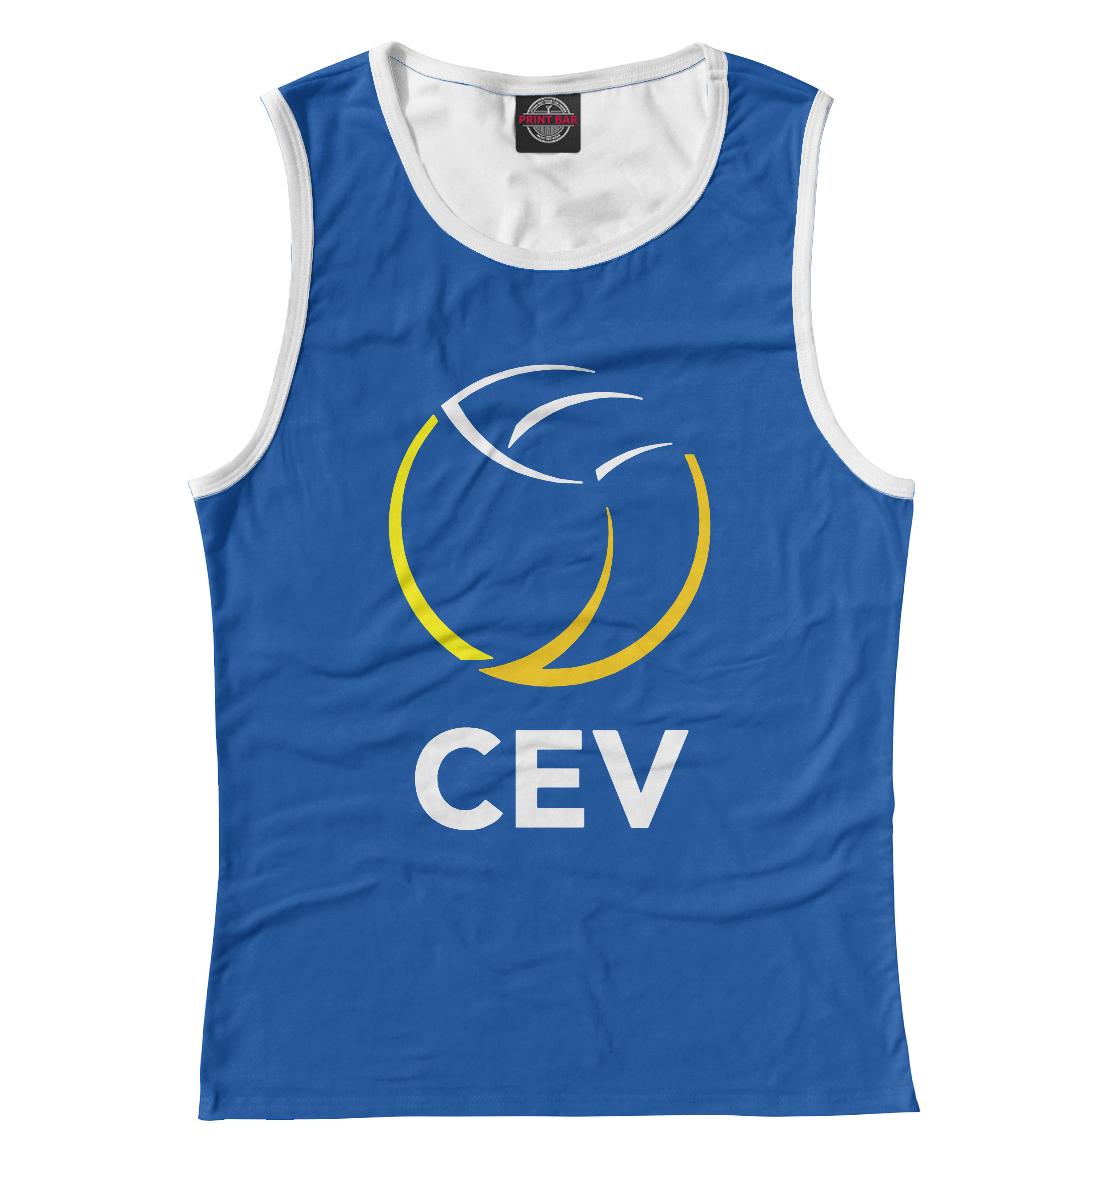 Купить Volleyball CEV (European Volleyball Confederation), Printbar, Майки, VLB-751765-may-1